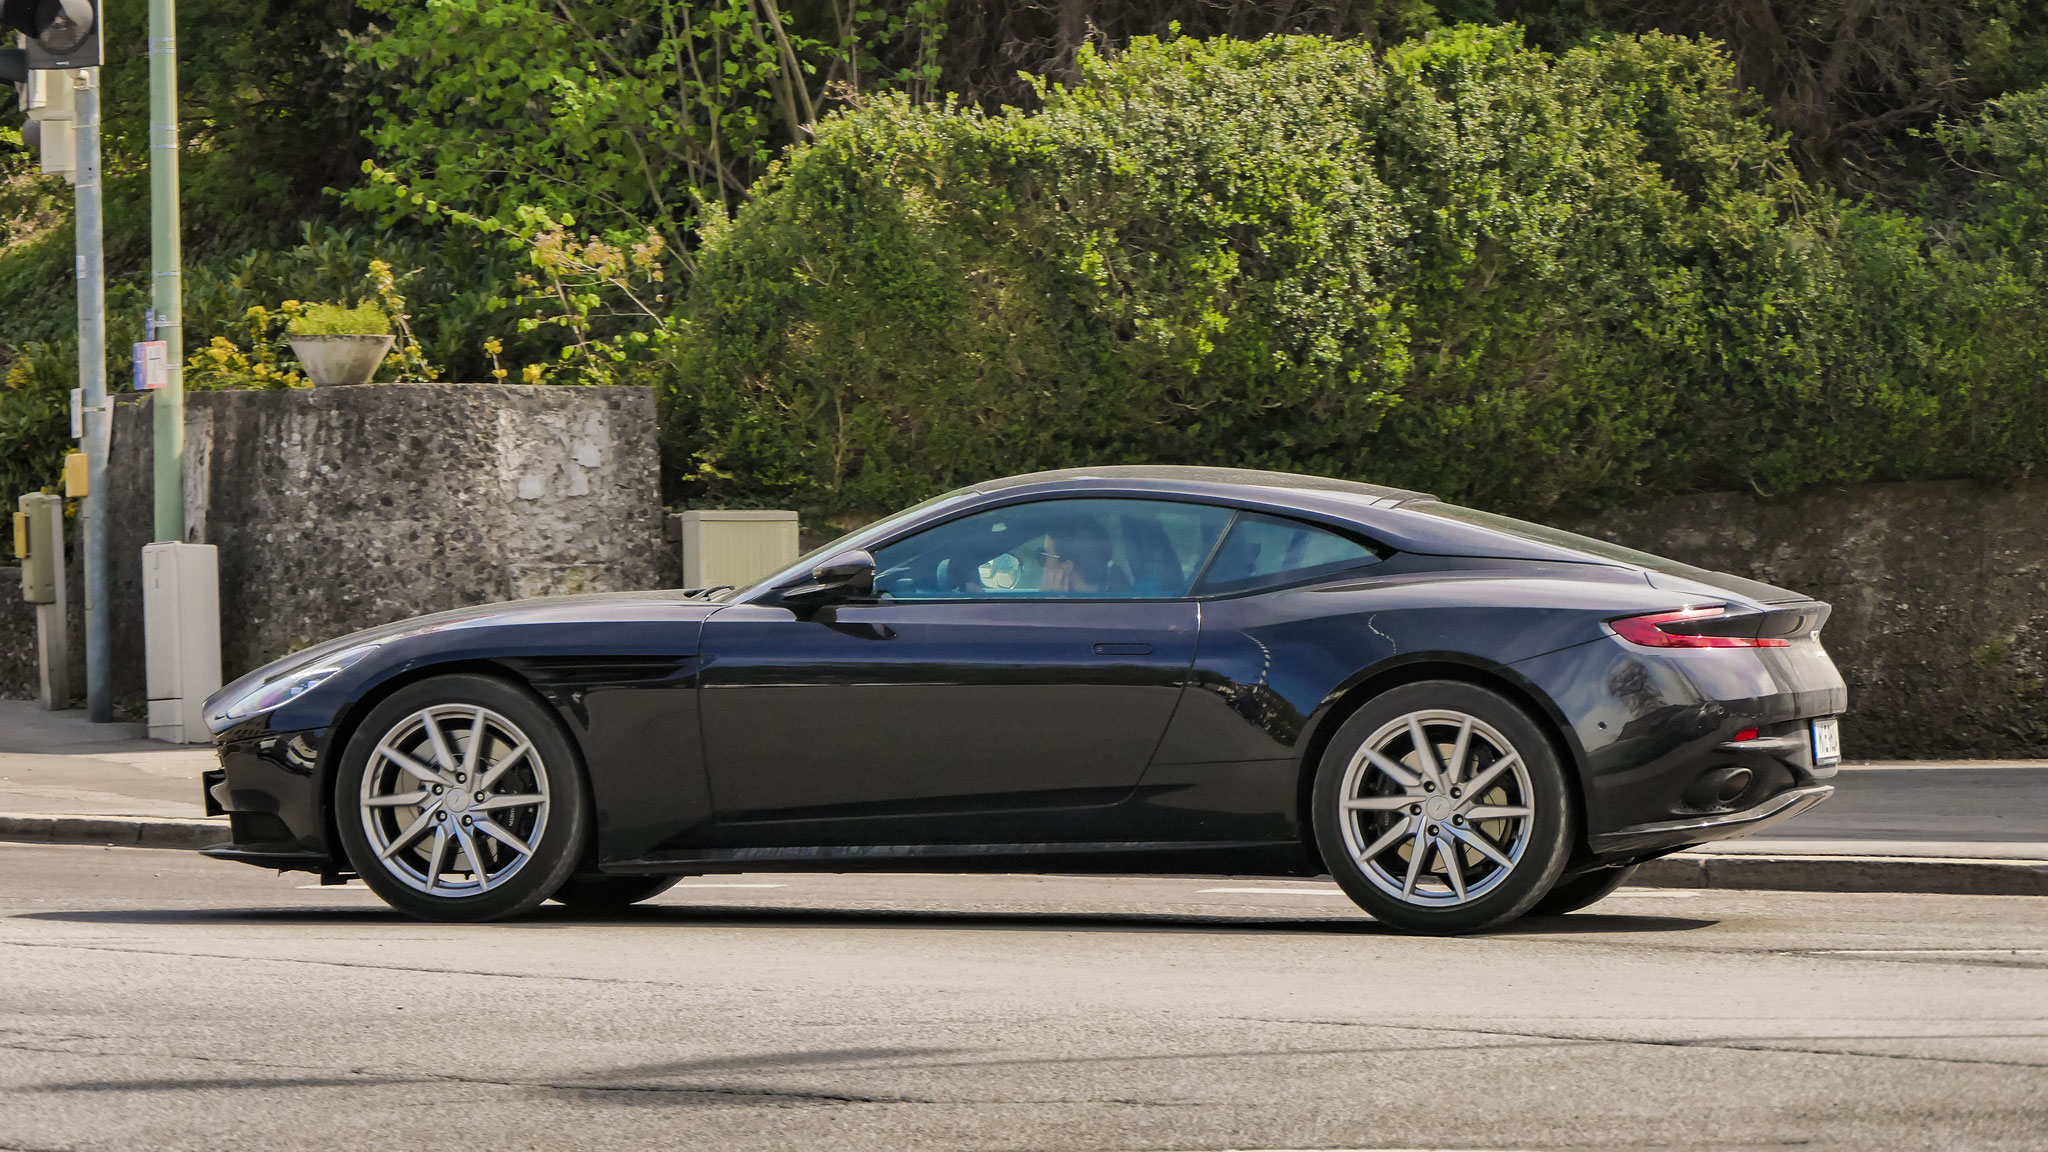 Aston Martin DB11 - M-E-9614